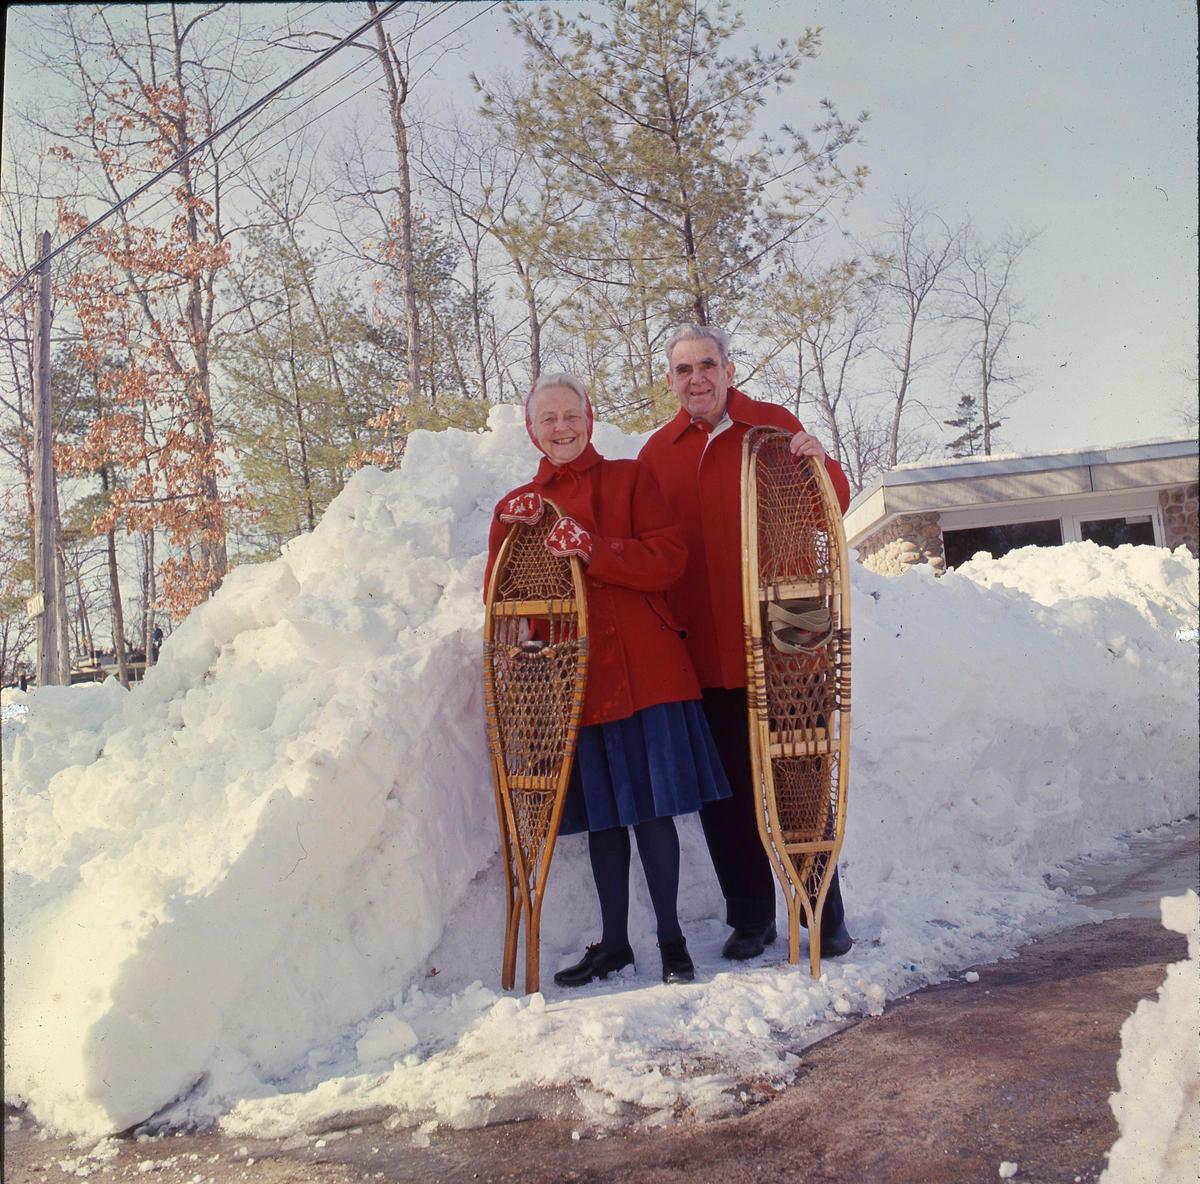 Caption: Joe and Faye Maddy in 1964, Credit: Interlochen Center for the Arts